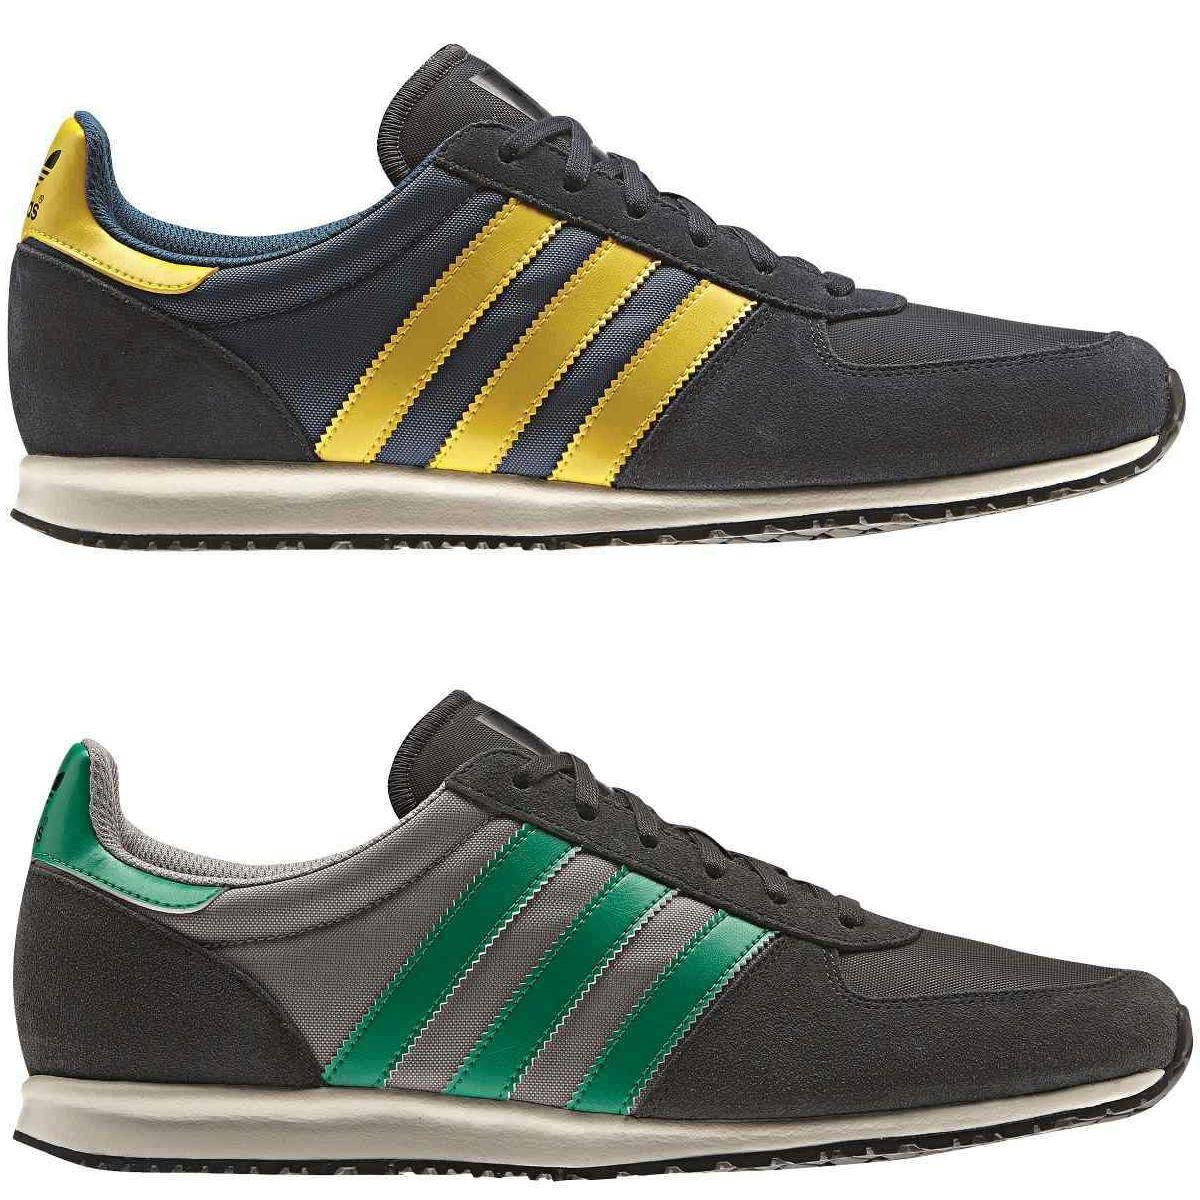 pretty nice 9f85a d175c Das Bild wird geladen Adidas-Originals-adiSTAR-Racer-Herren-Schuhe-Sneakers -Turnschuhe-